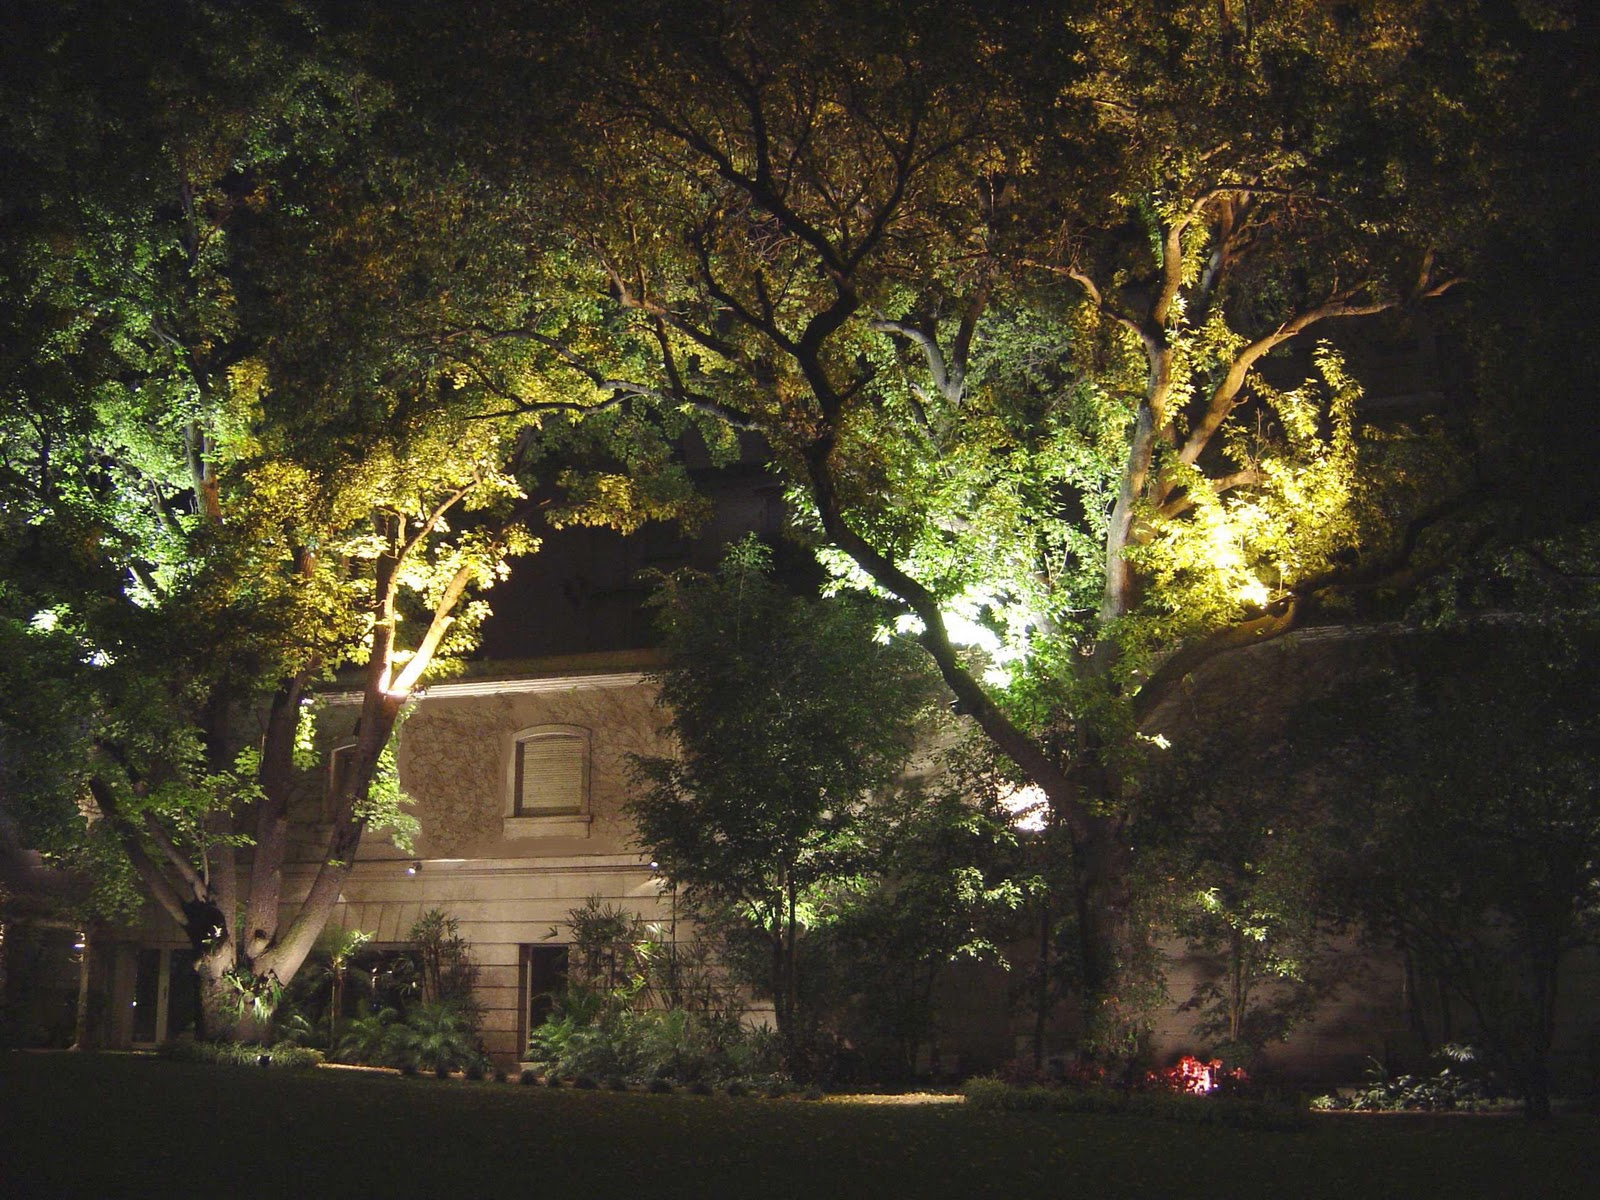 Iluminacion e p s i iluminacion de parques y jardines for Iluminacion arboles jardin